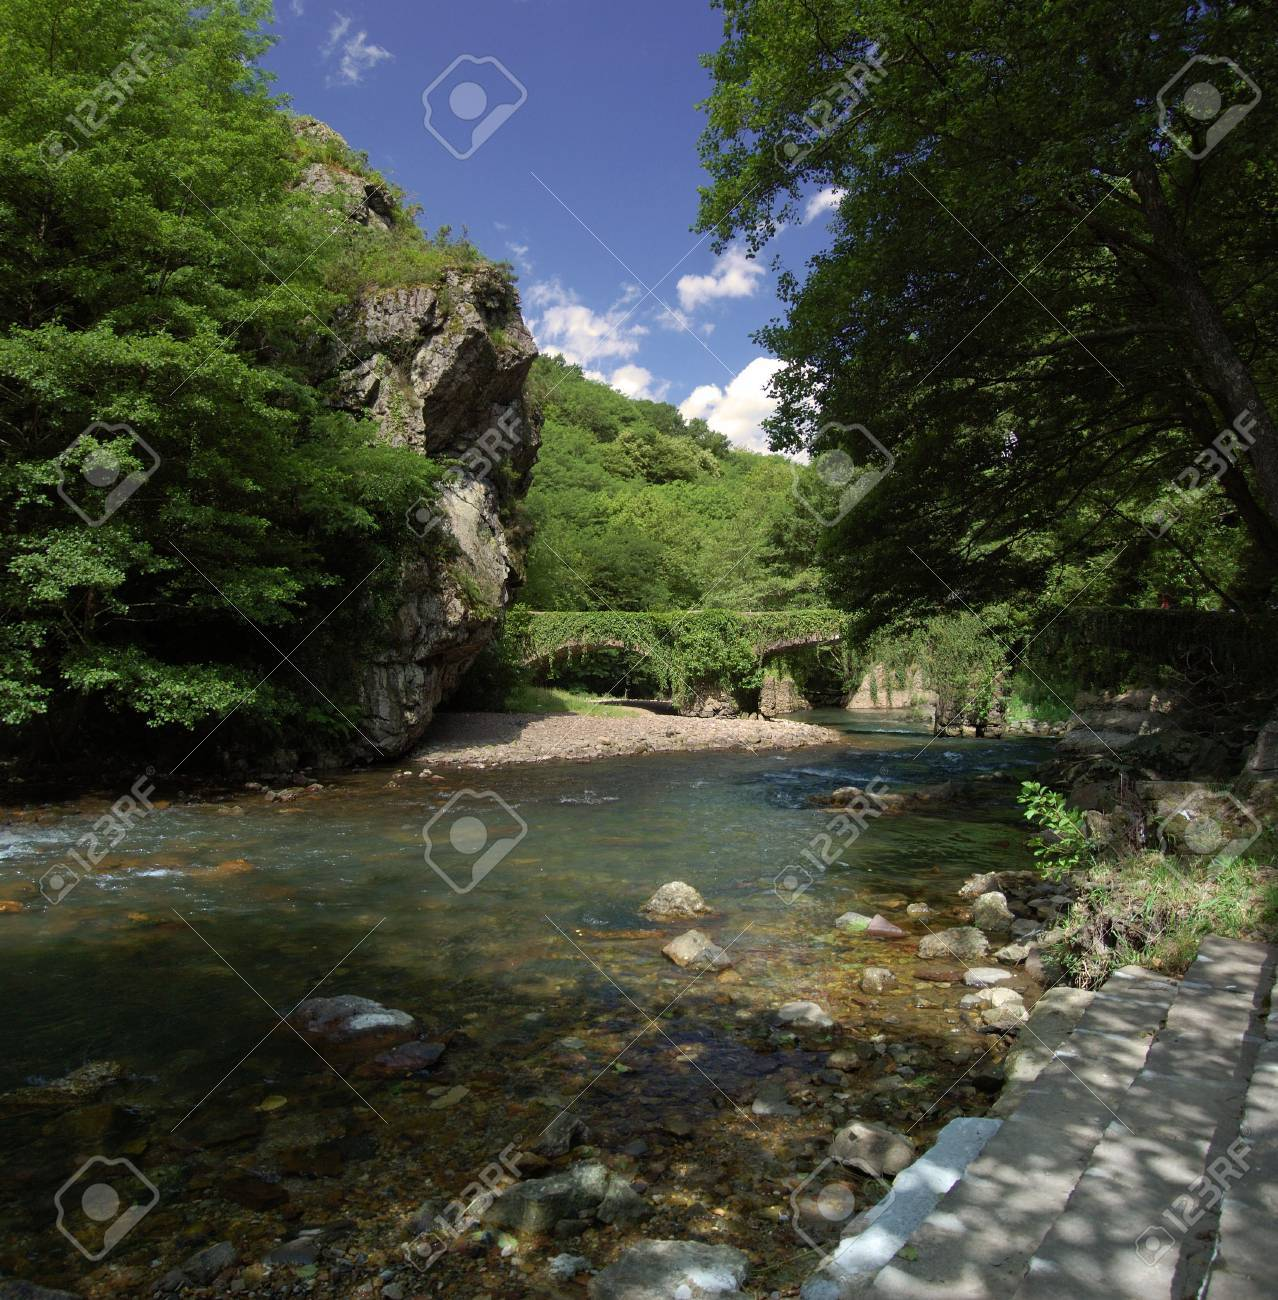 Leiza river with trees and vegetation. Leizaran Valley, Navarra and Gipuzkoa, Spain Stock Photo - 1282673